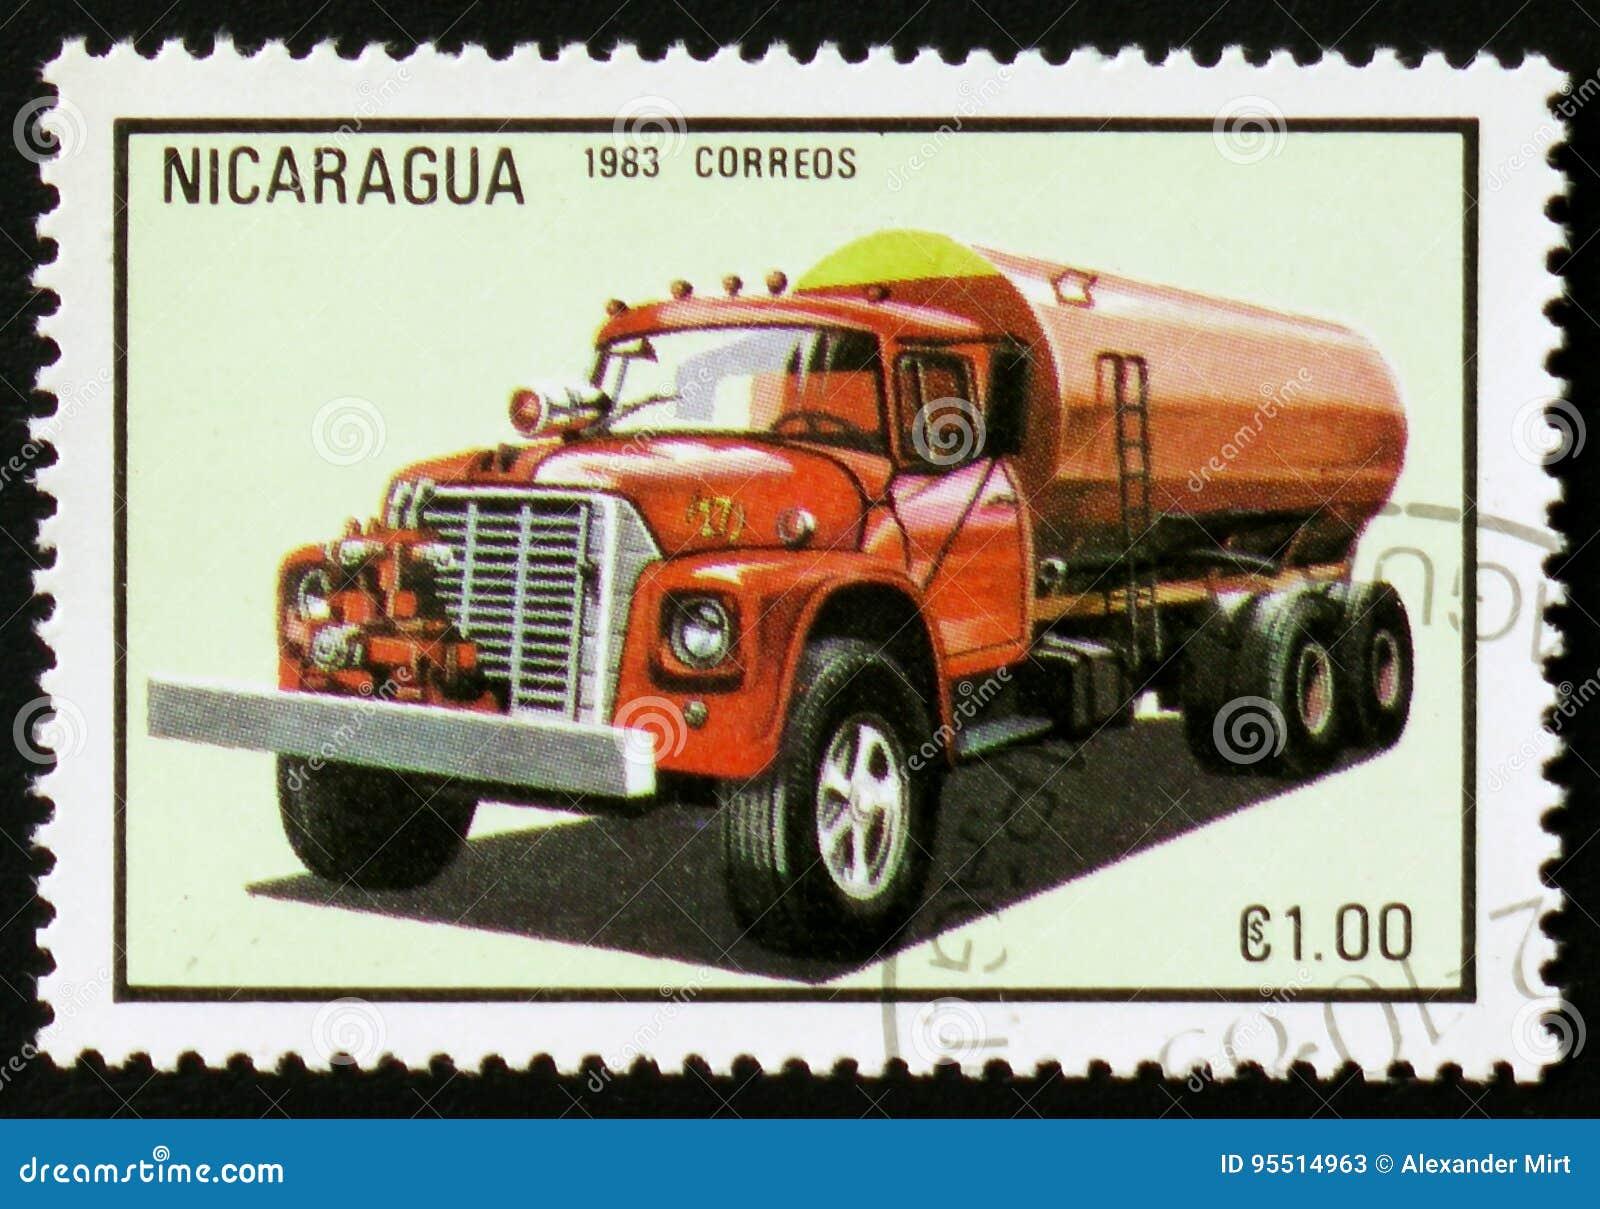 Firetruck, series, circa 1983